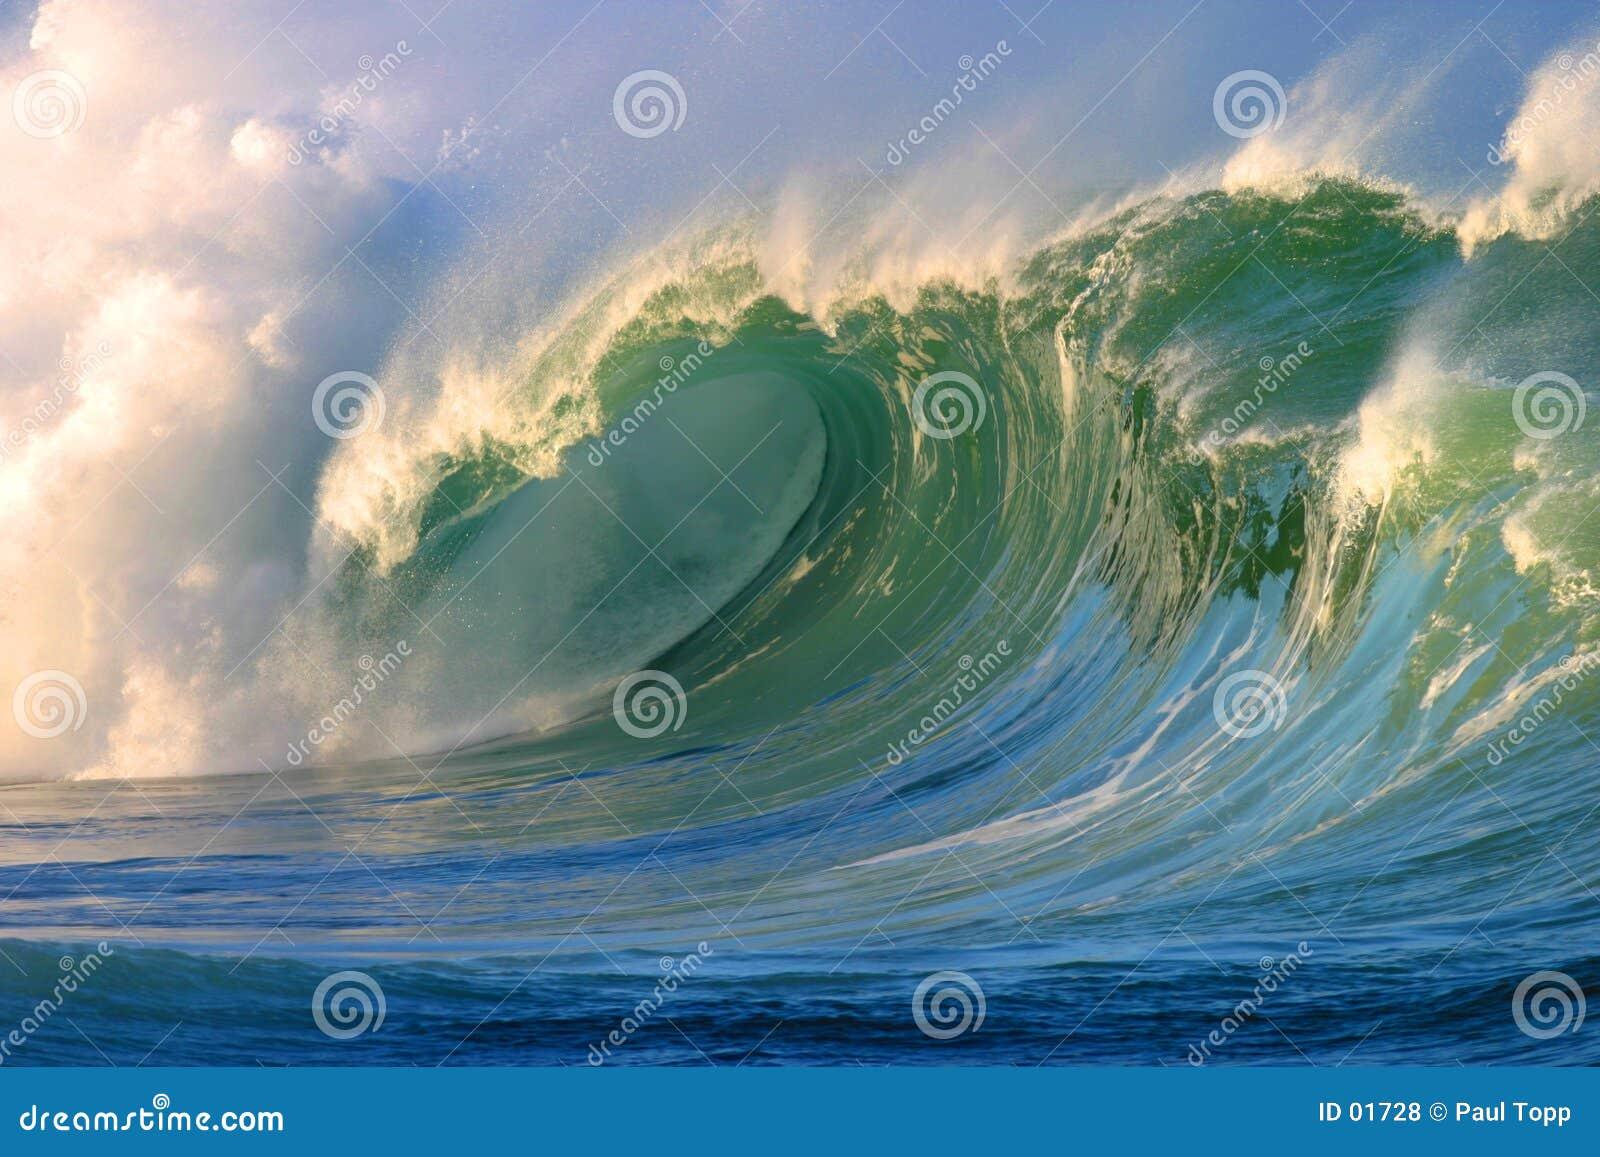 Powerful Crashing Surfing Wave Waimea Bay Hawaii